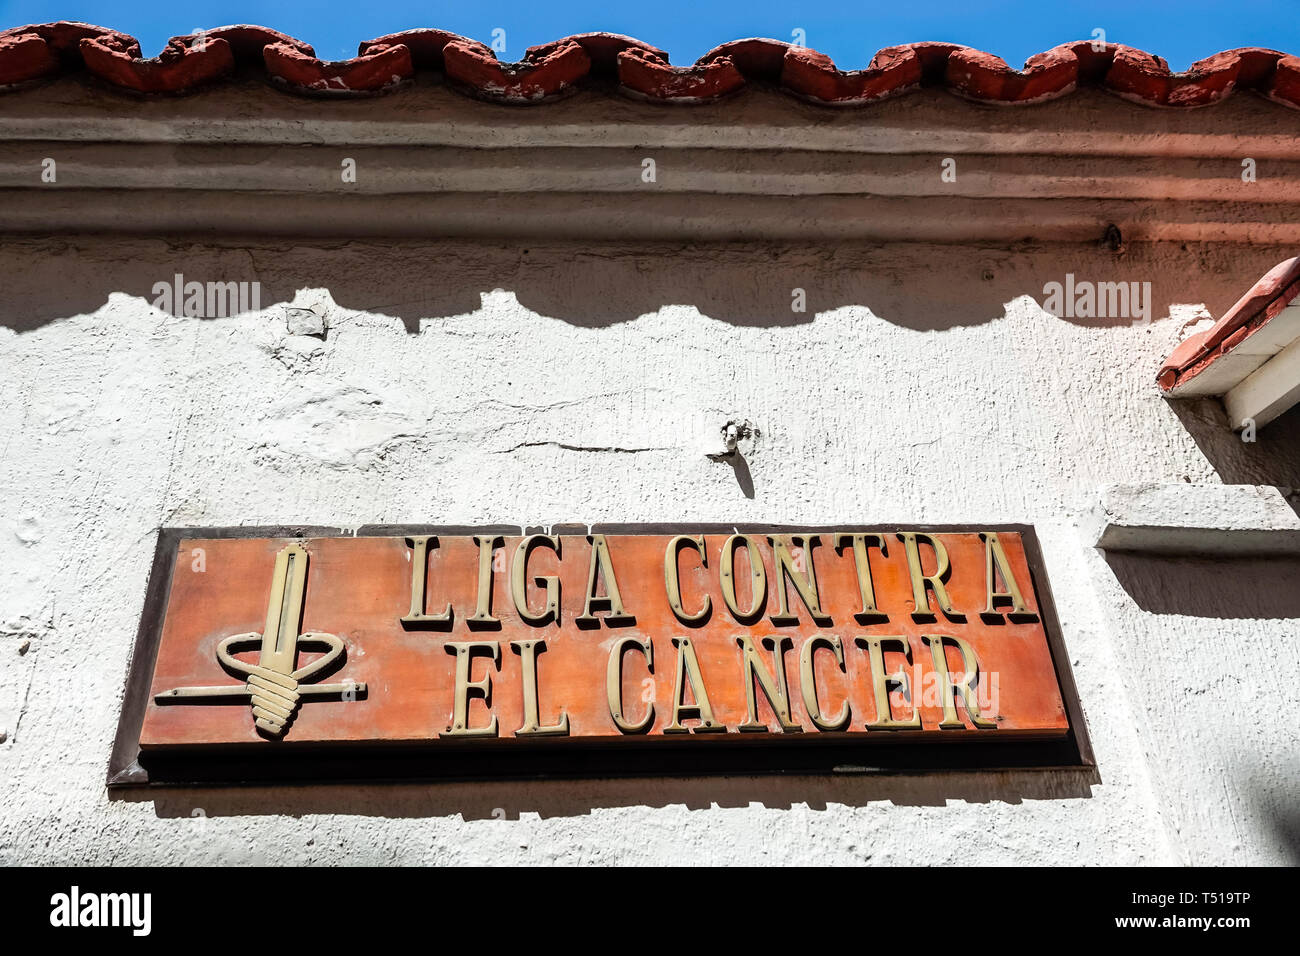 Colombia Cartagena Old Walled City Center centre Centro Liga Contra El Cancer anti-cancer league nonprofit sign - Stock Image